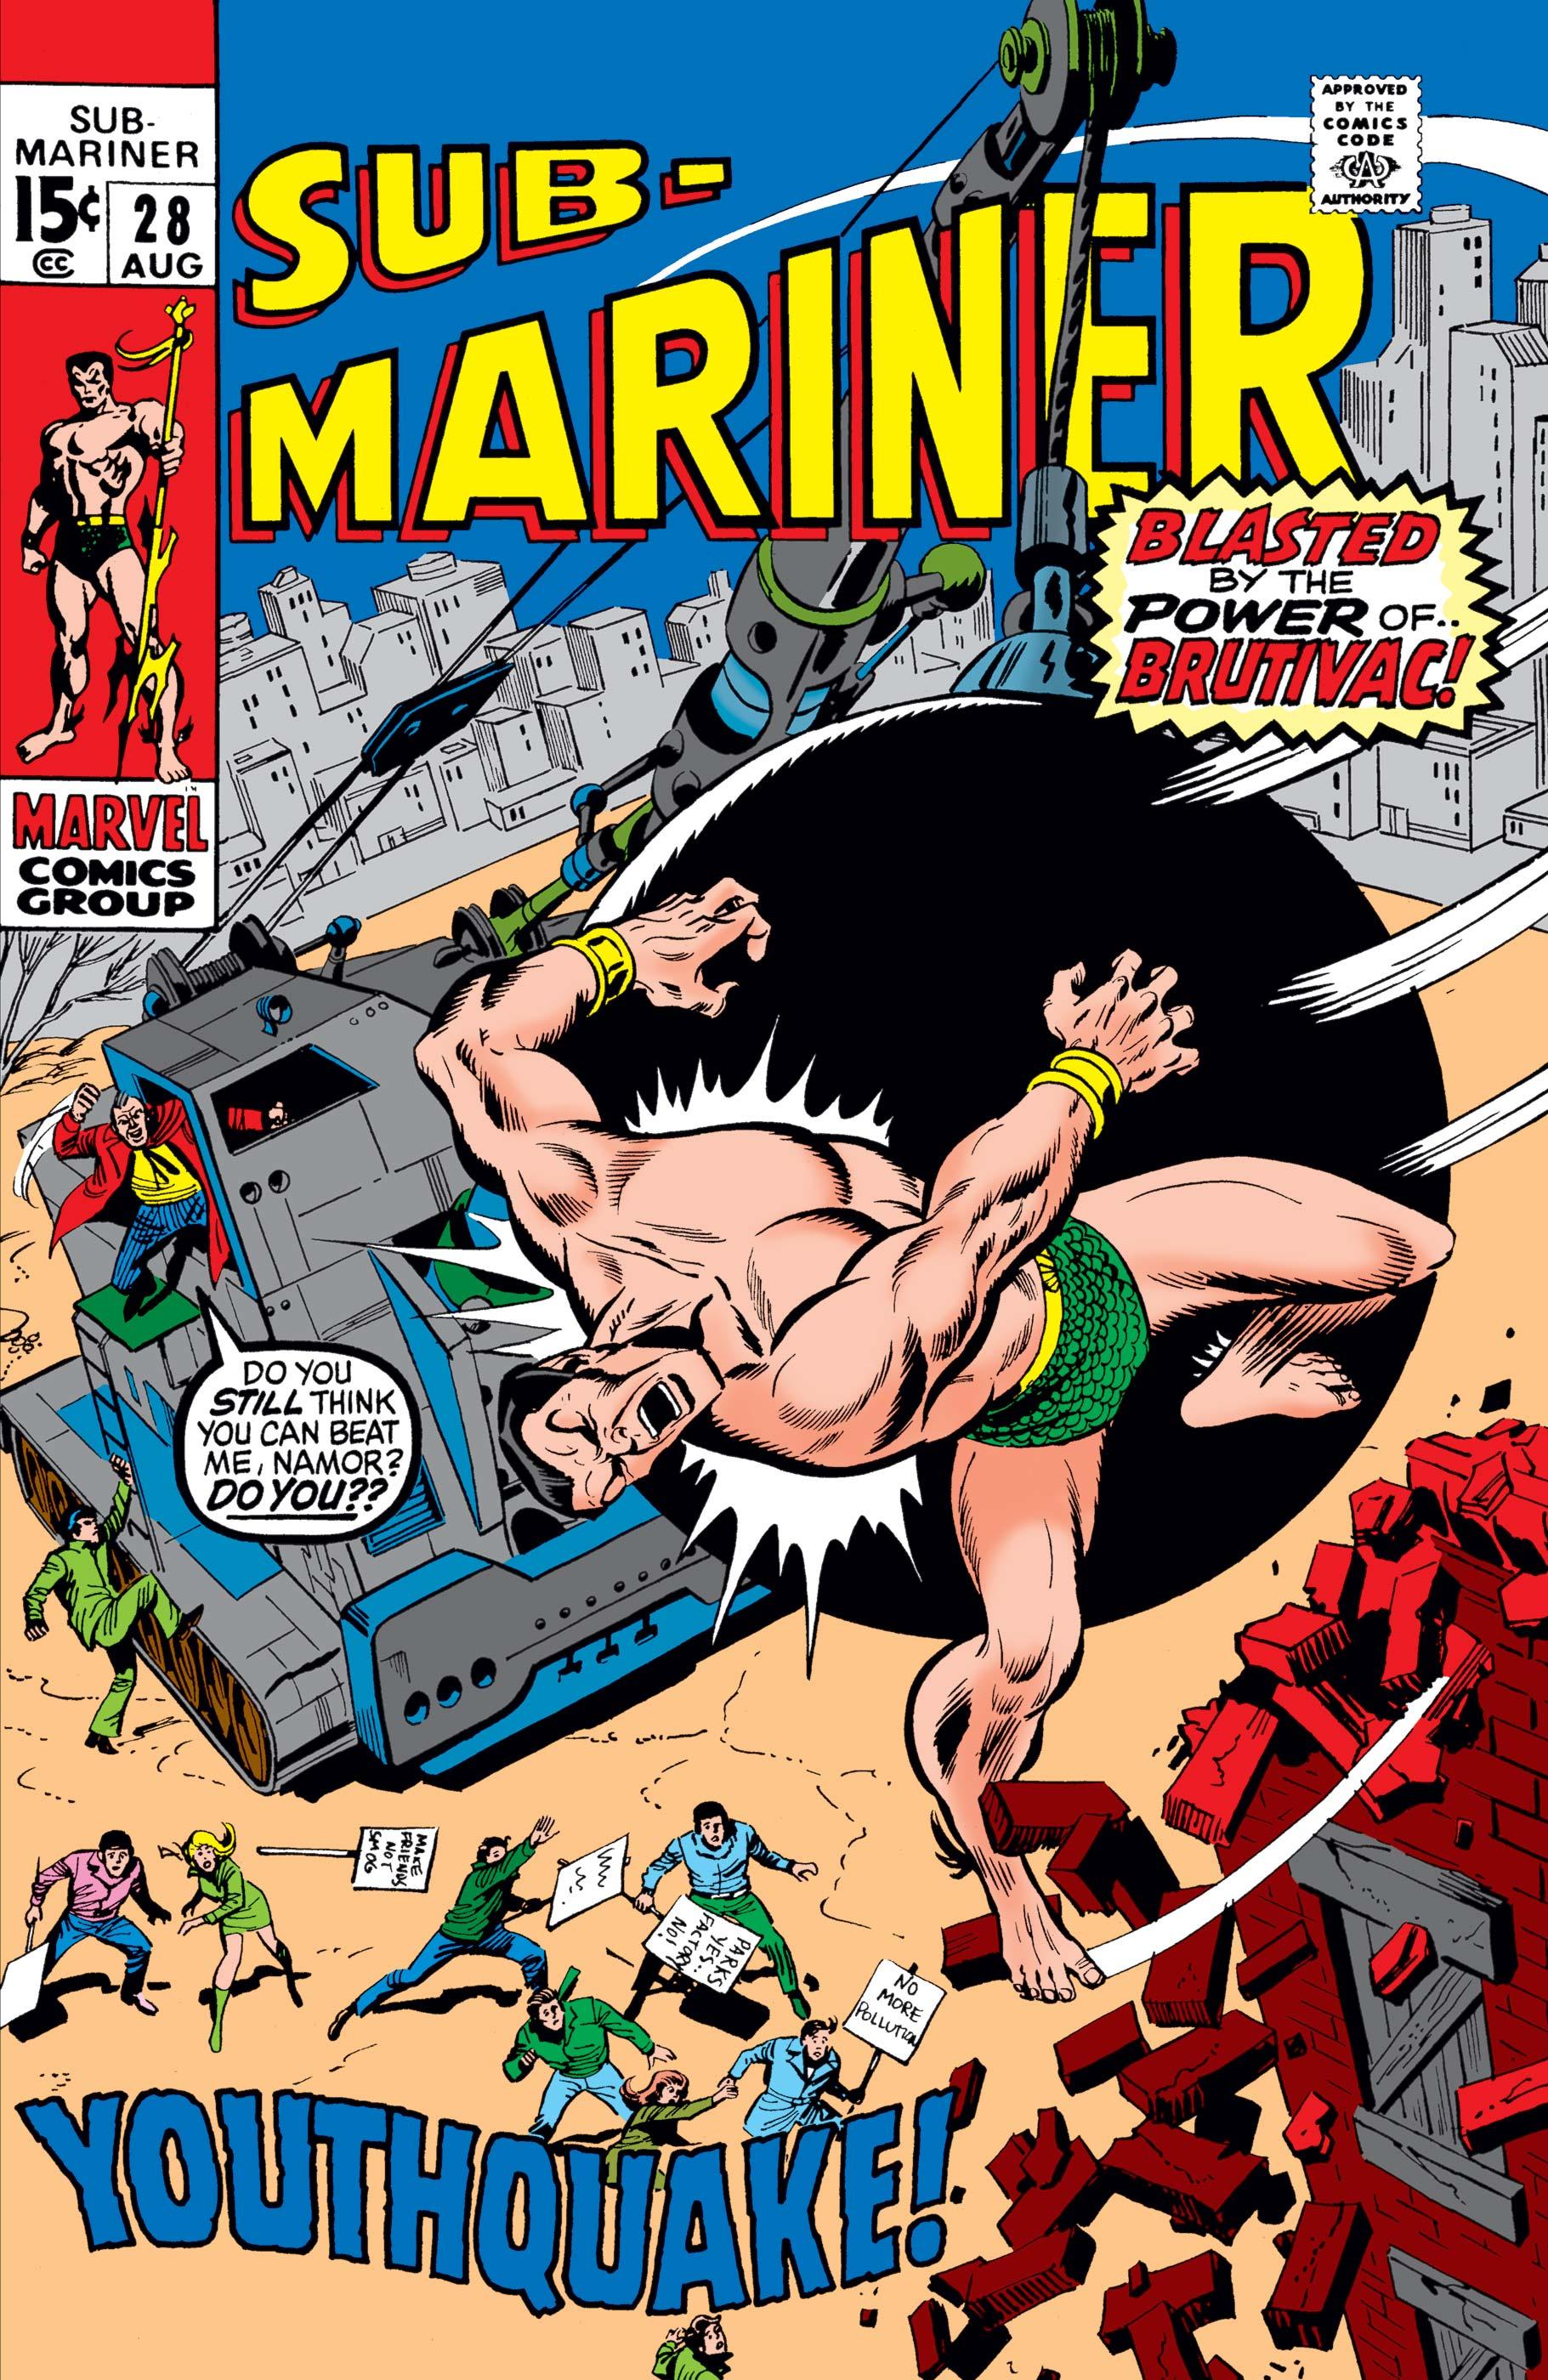 Sub-Mariner (1968) #28